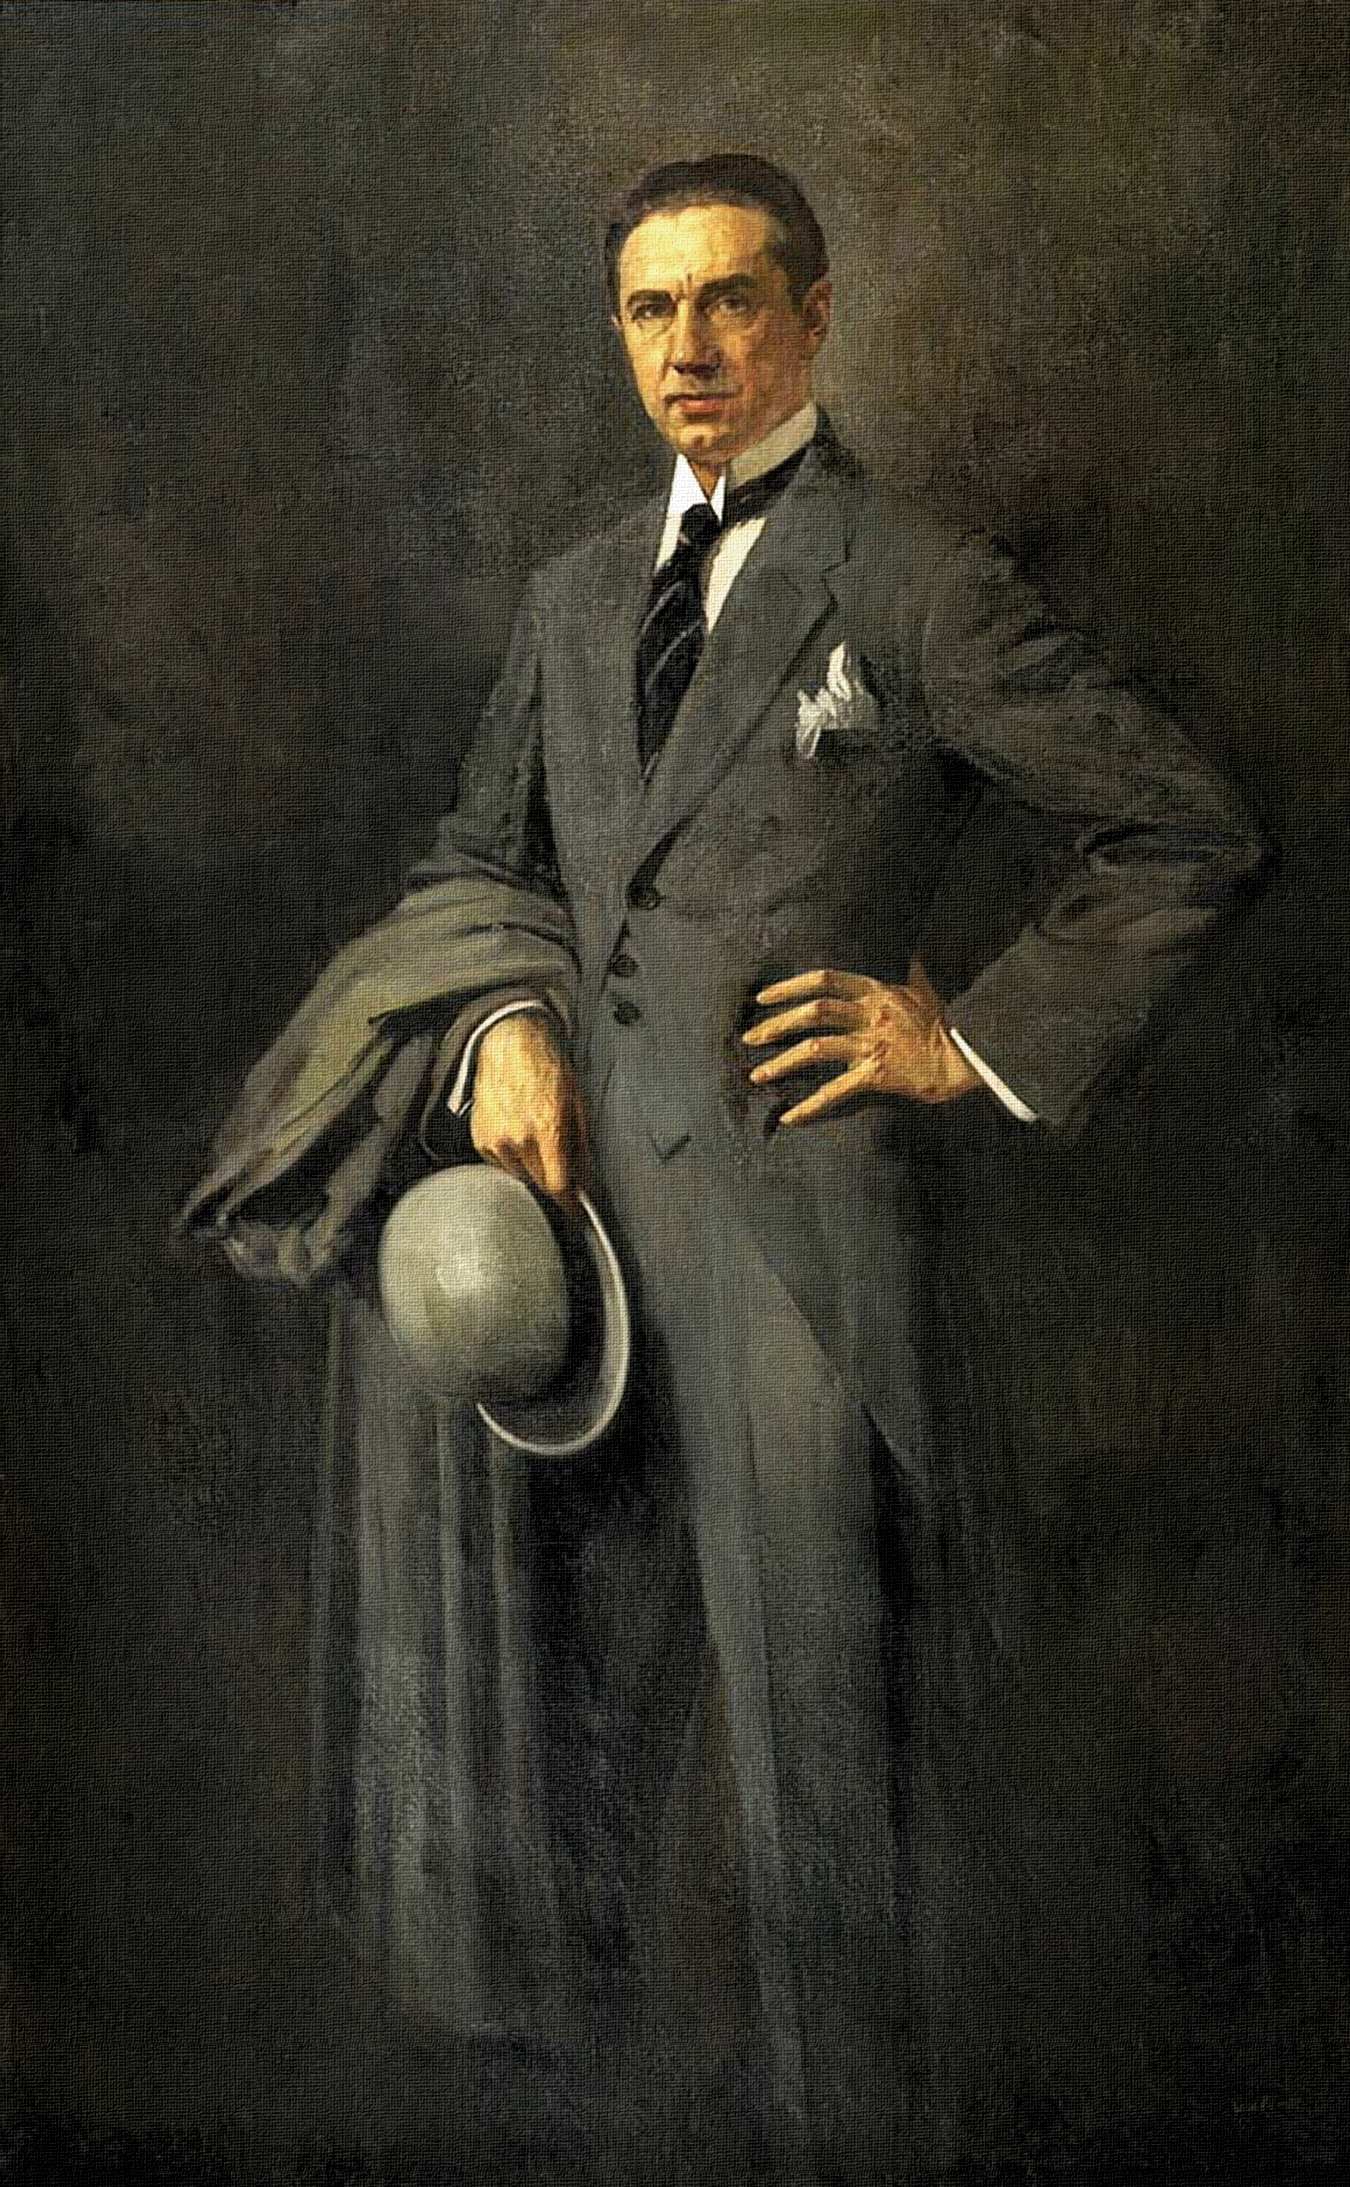 Bela Lugosi - painted portrait by DarkSaxeBleu